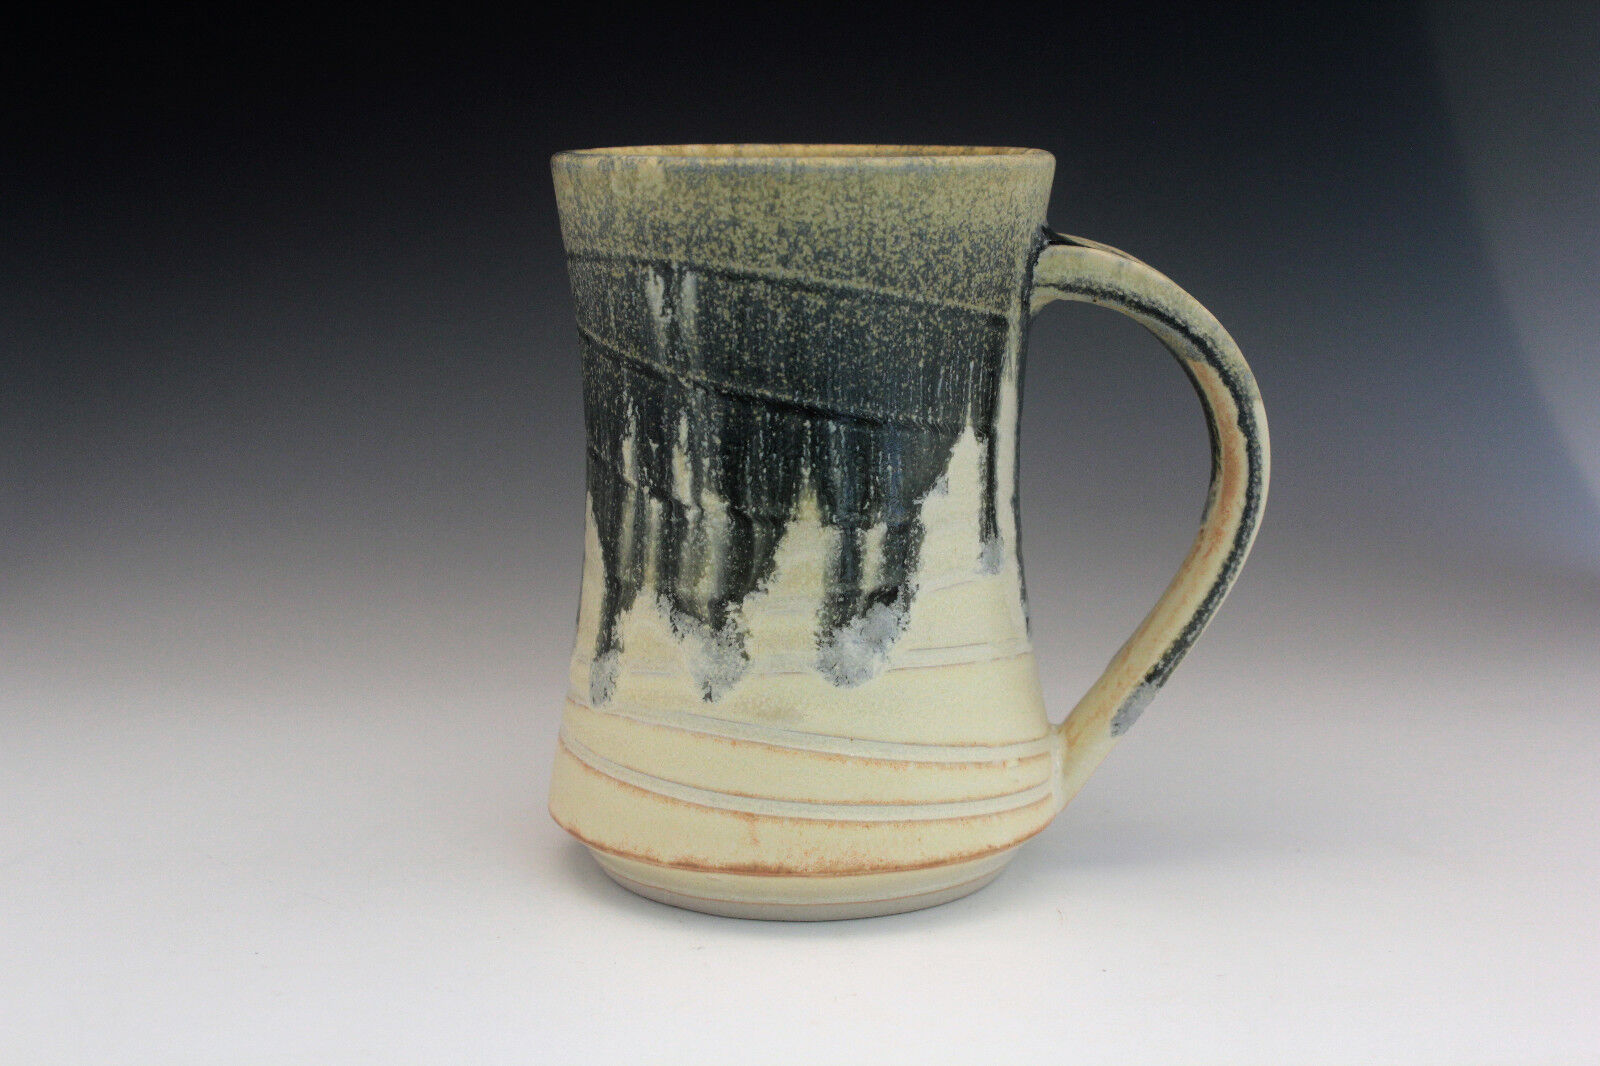 Pottery Handmade Wheel Thrown Coffee Mug/Cup Yellow & Blue Drip Glaze - Rollins